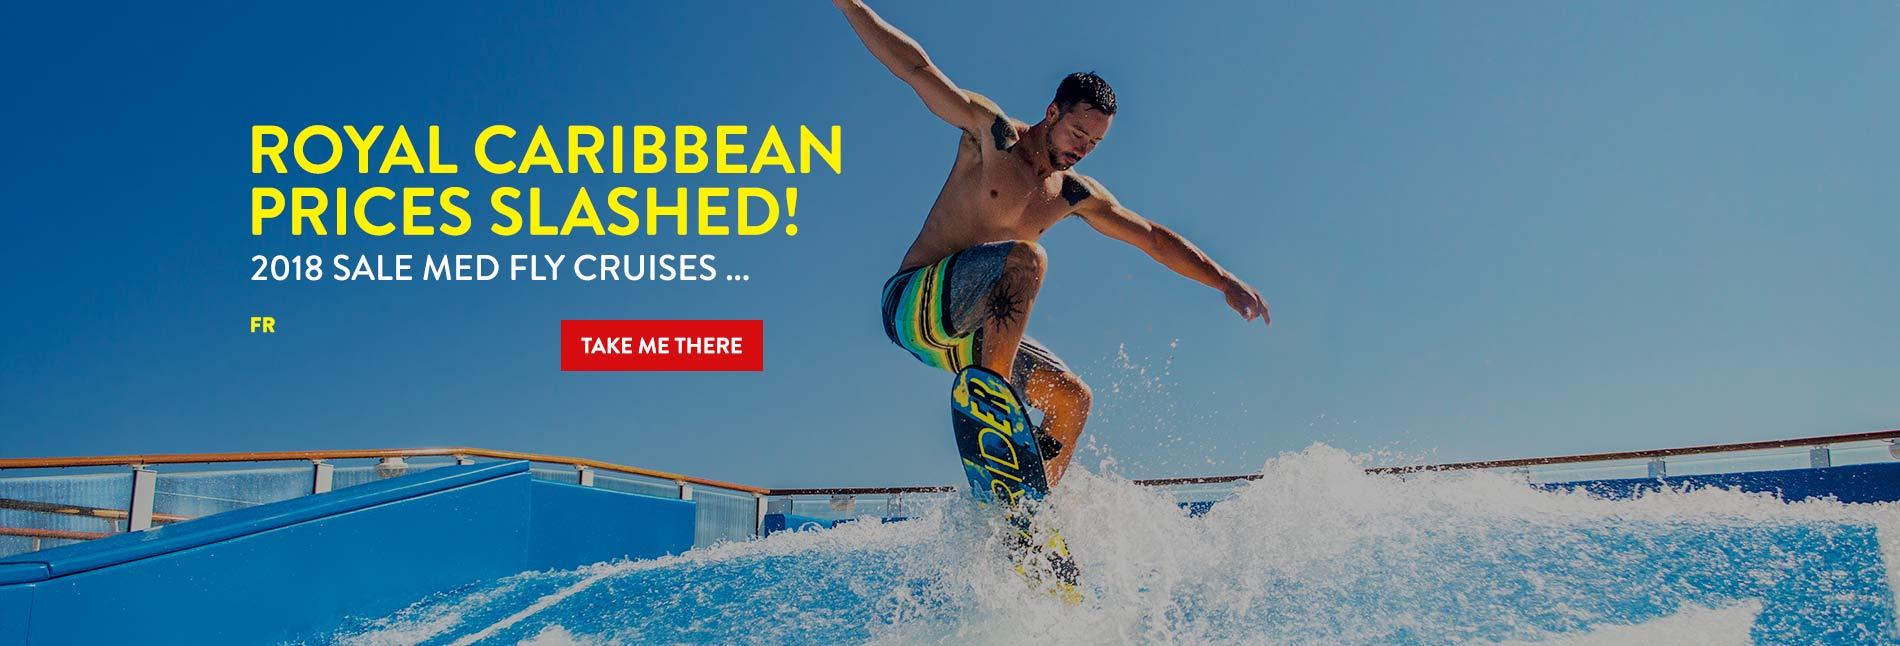 Cruise Deals 2017 2018 Cheap Cruises Holiday Deals